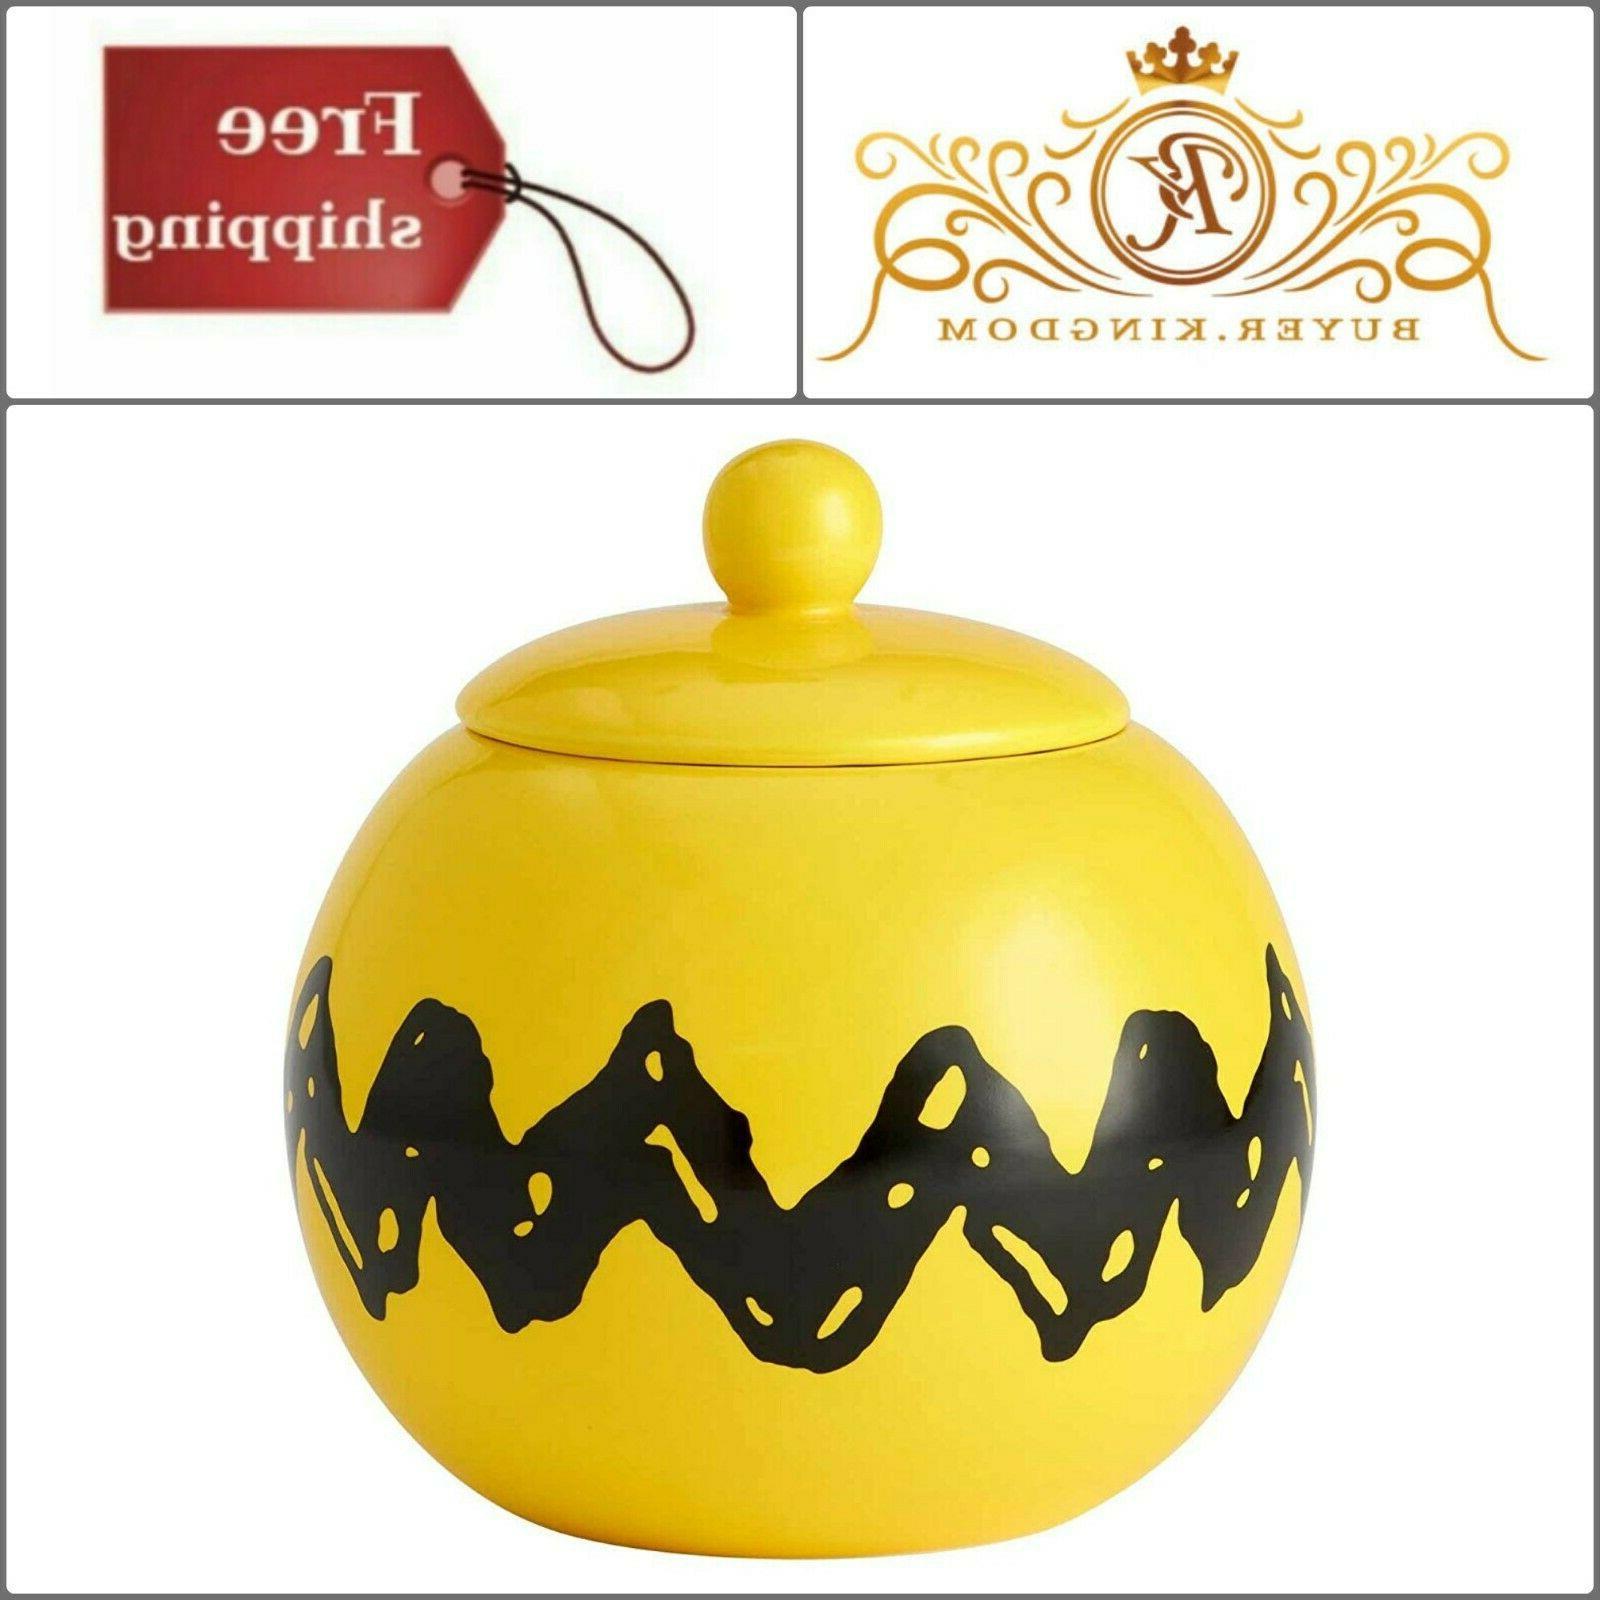 Zigzag Ceramic Cookie Holder Storage Jar Yellow Black Dry Fo